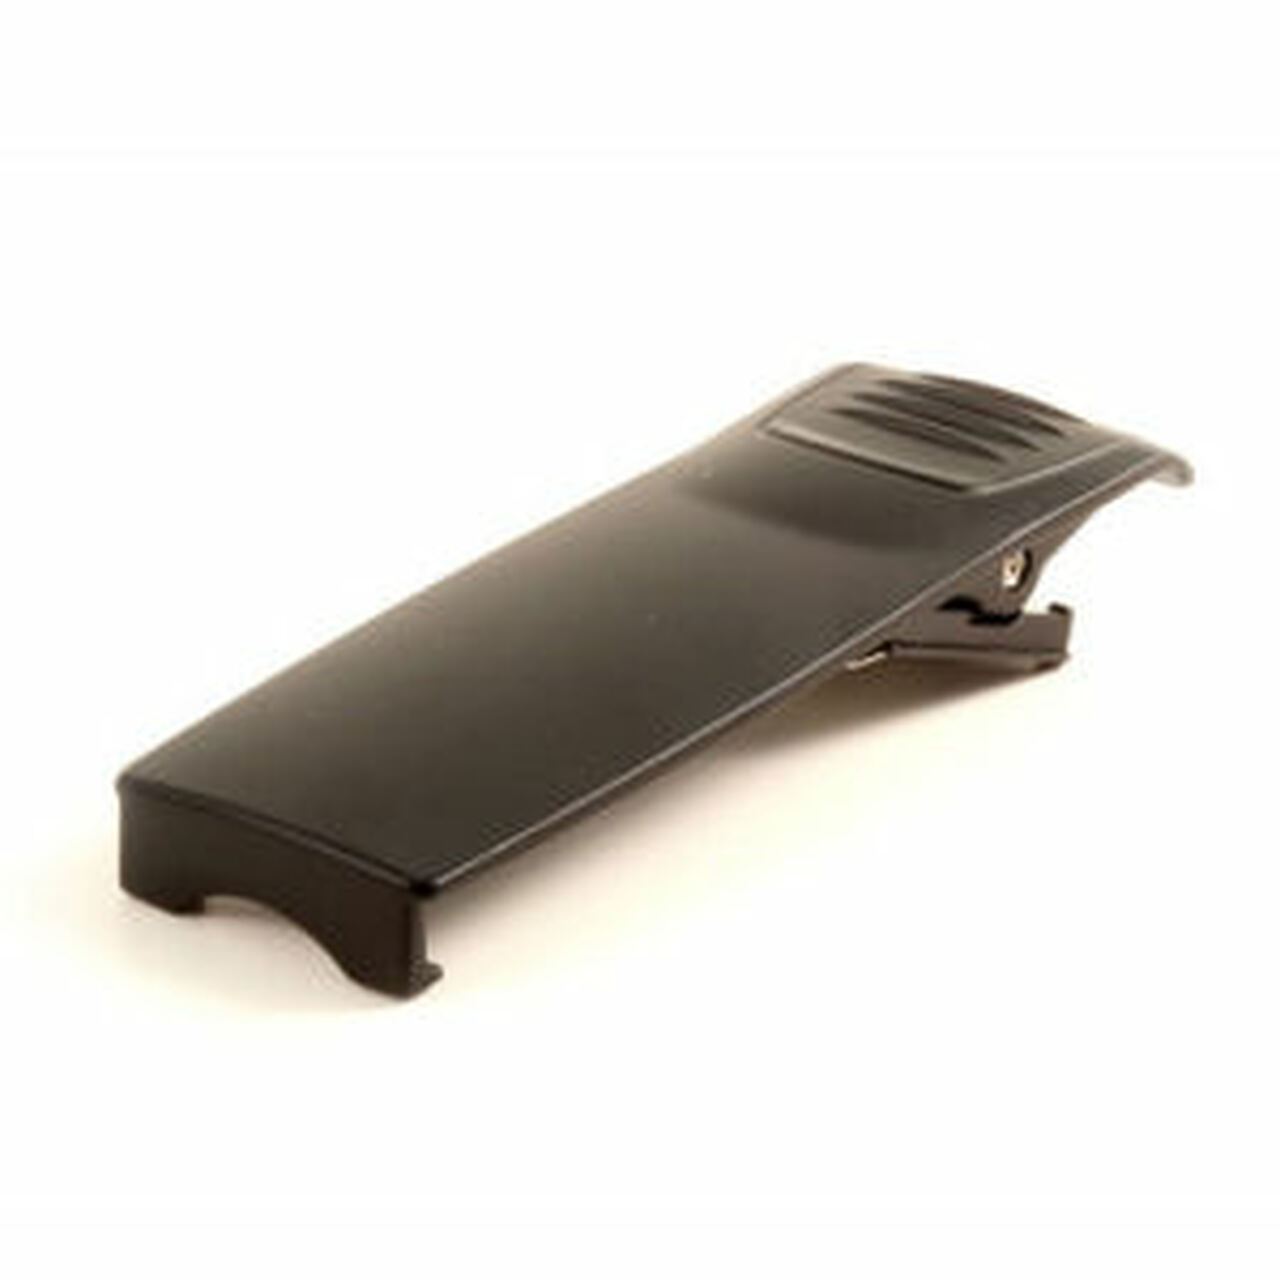 M/A-Com P7350 Metal, Spring Loaded Belt Clip